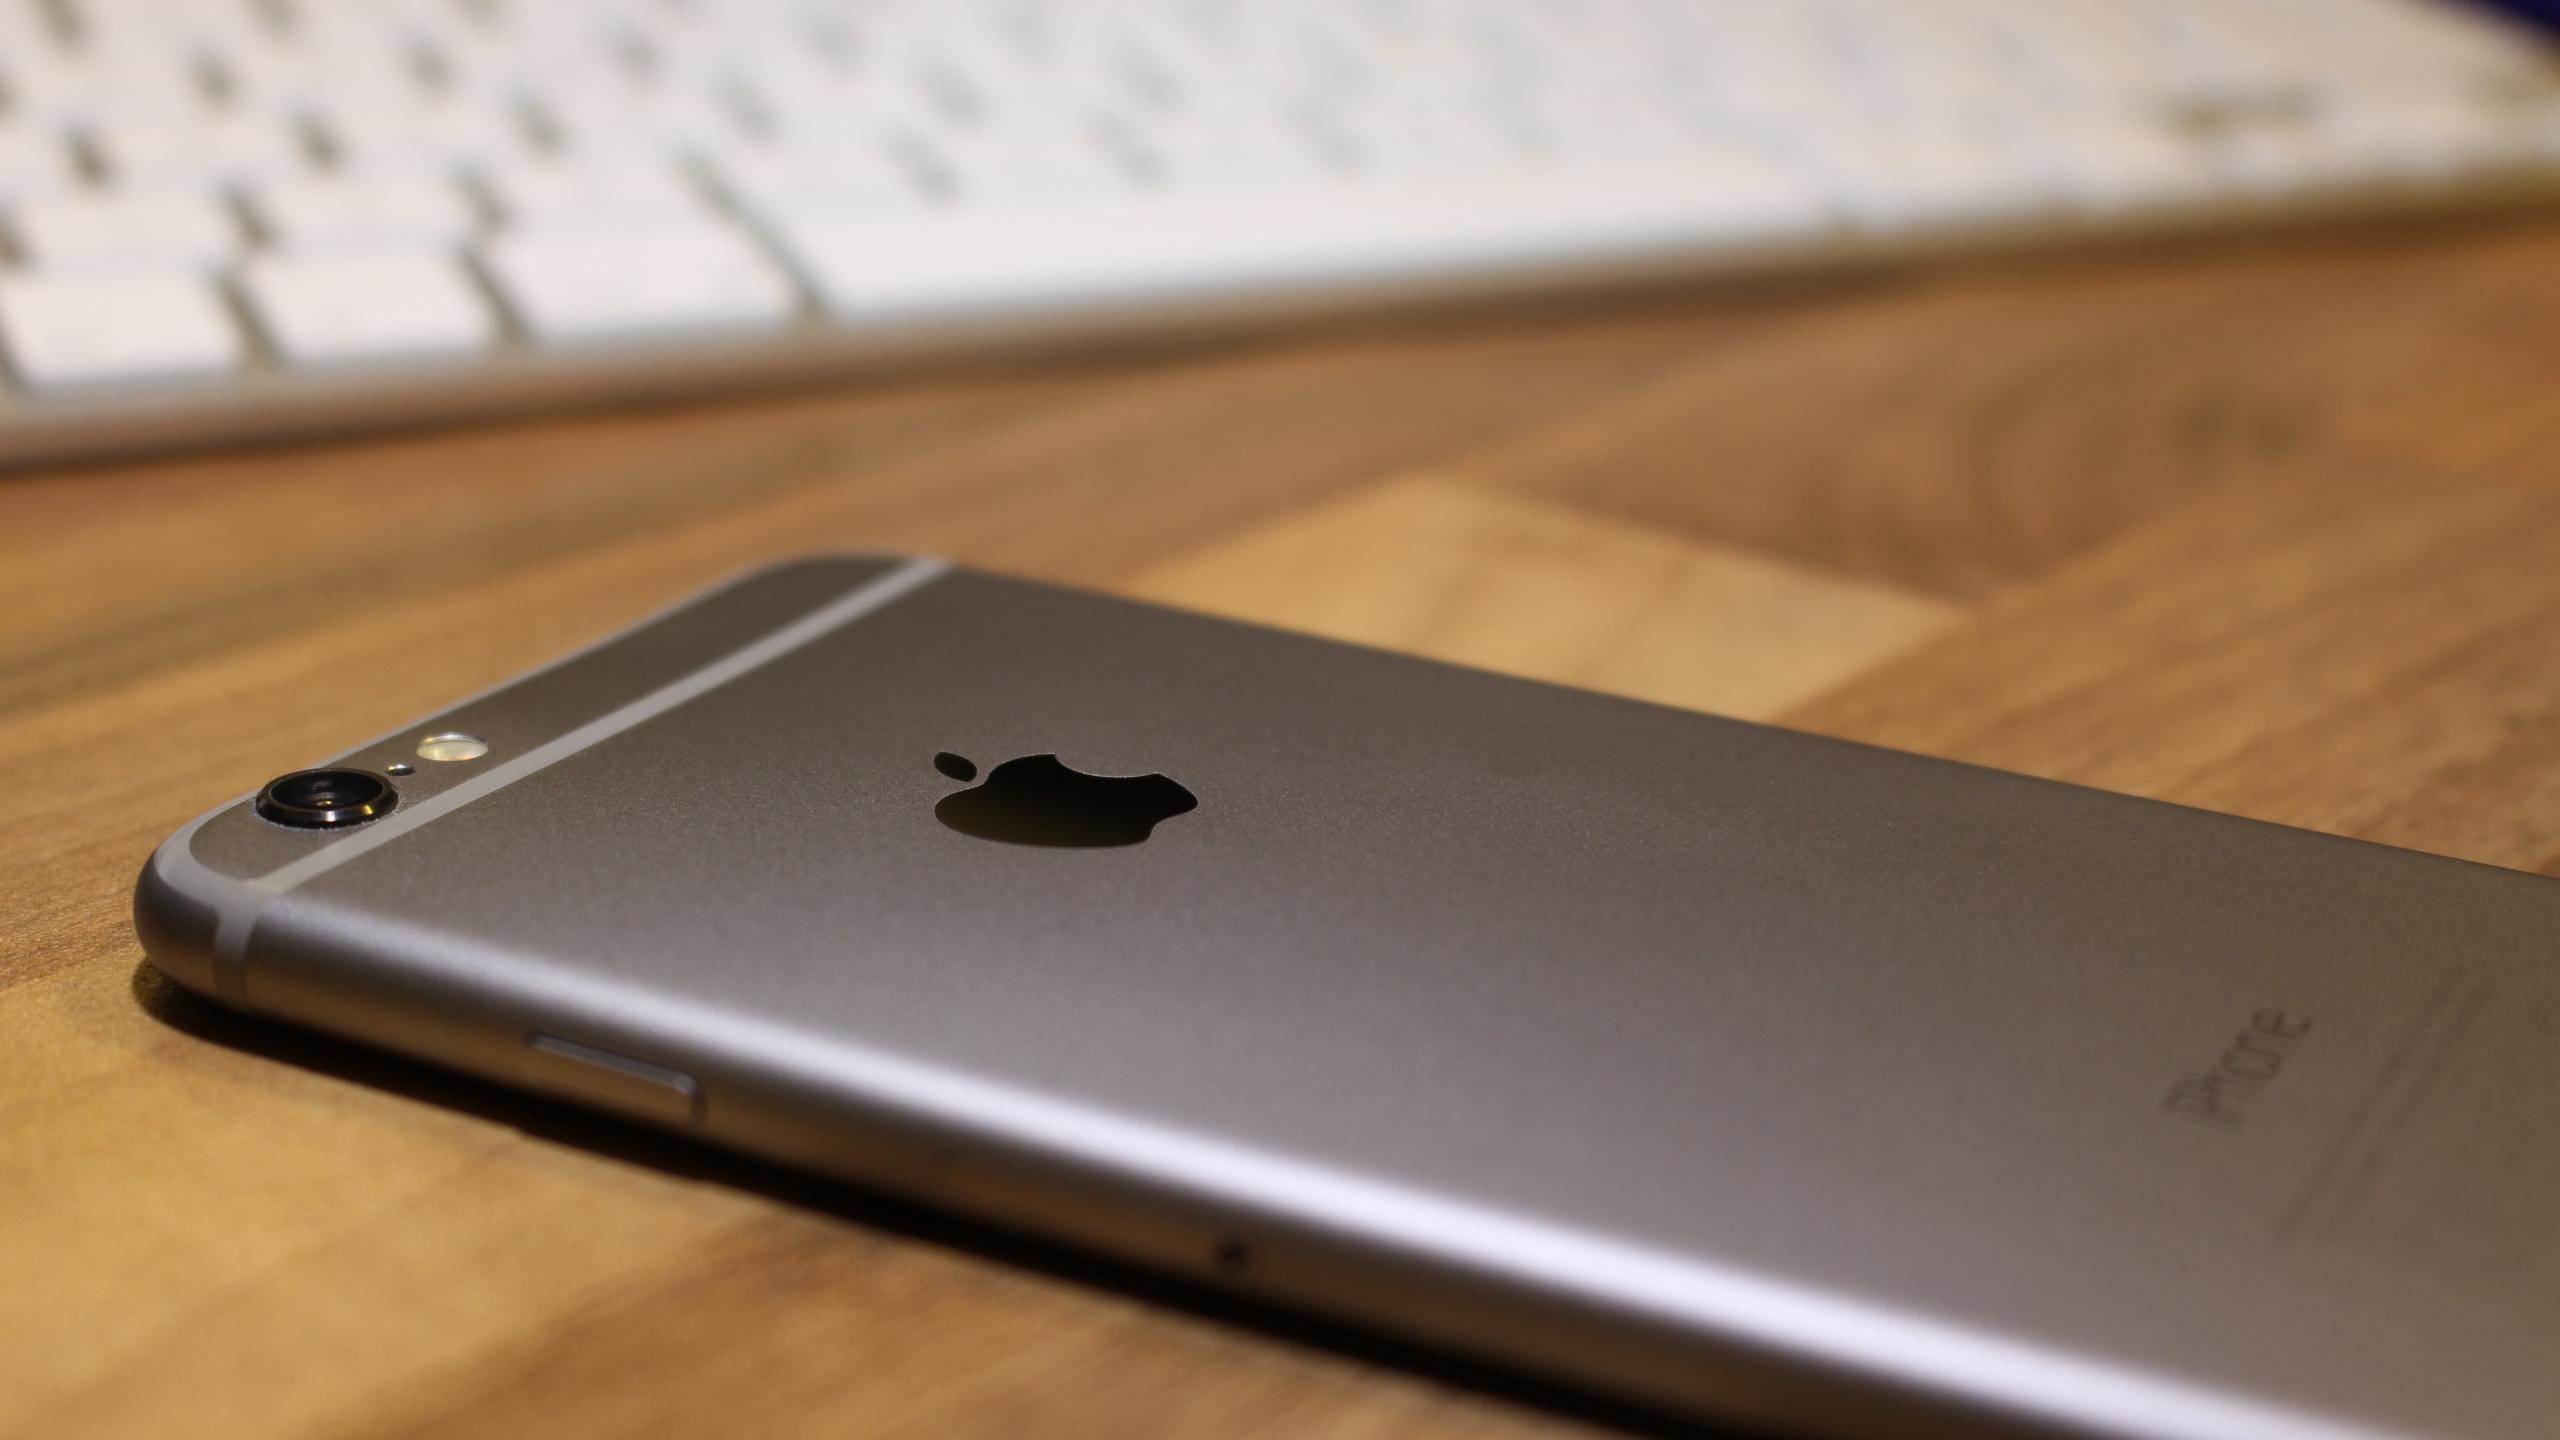 2560x1440 Apple Iphone 6 Iphone 1440p Resolution Wallpaper